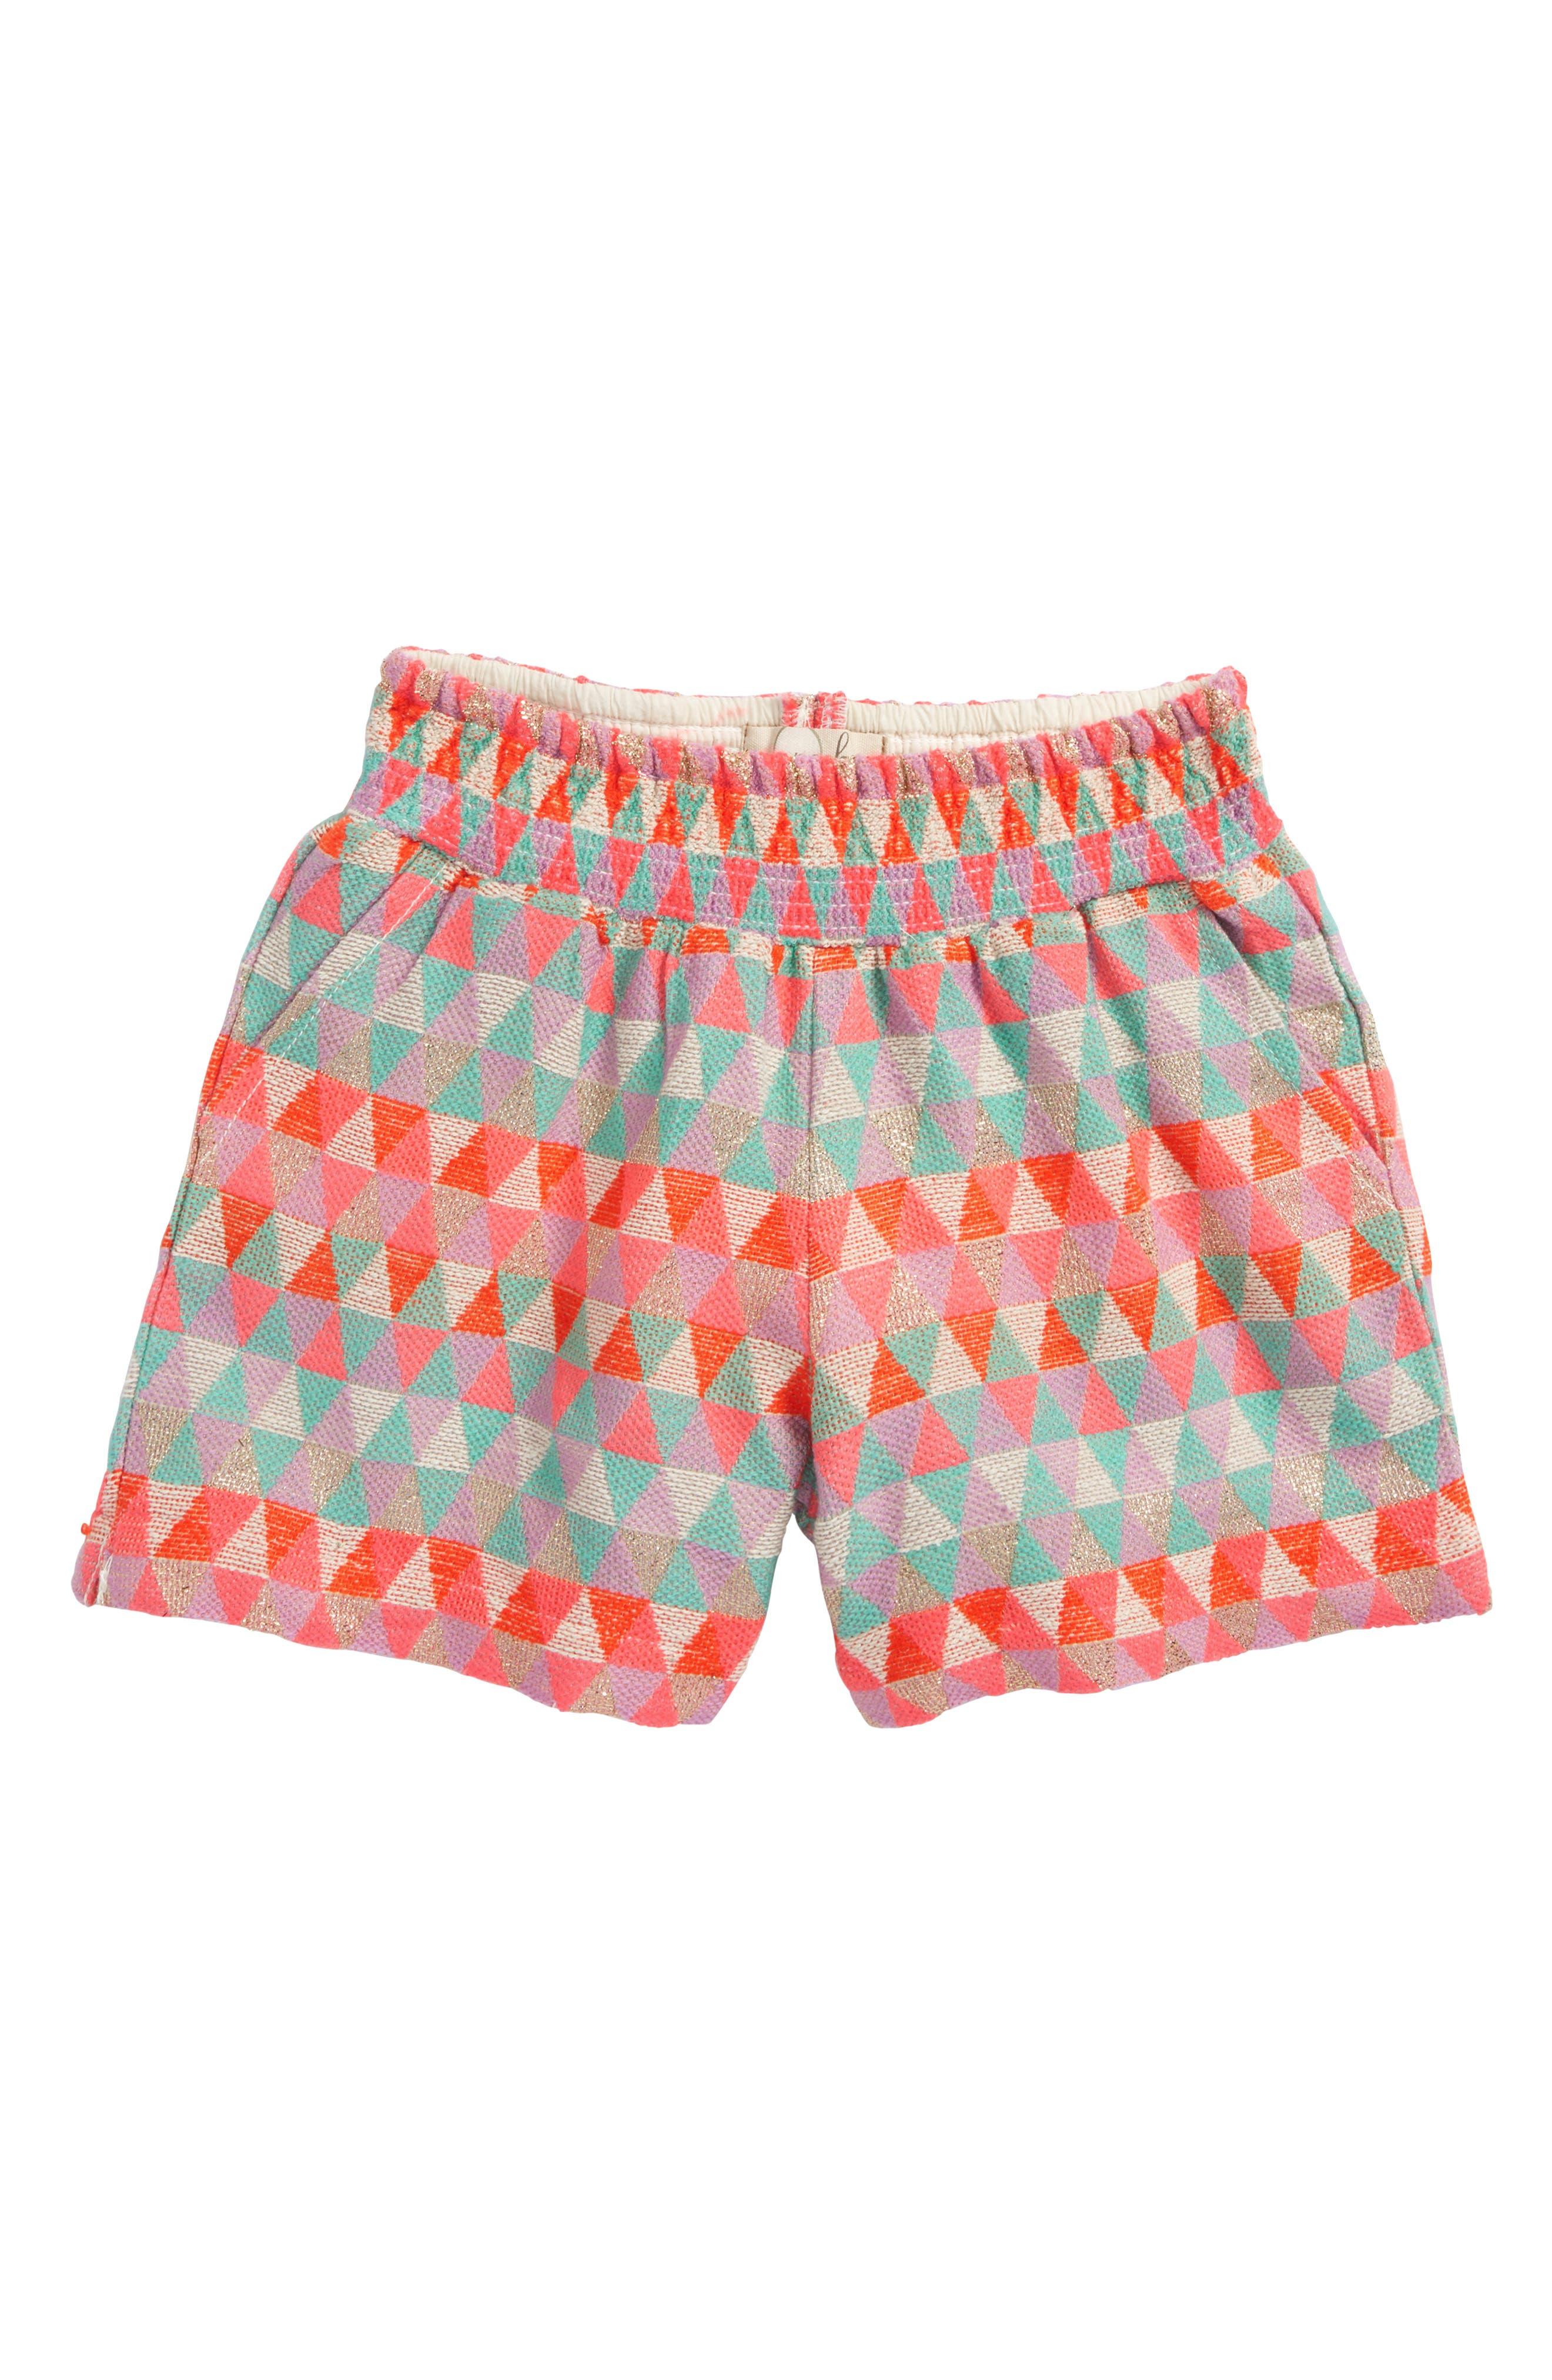 Mexico Shorts,                         Main,                         color, Coral